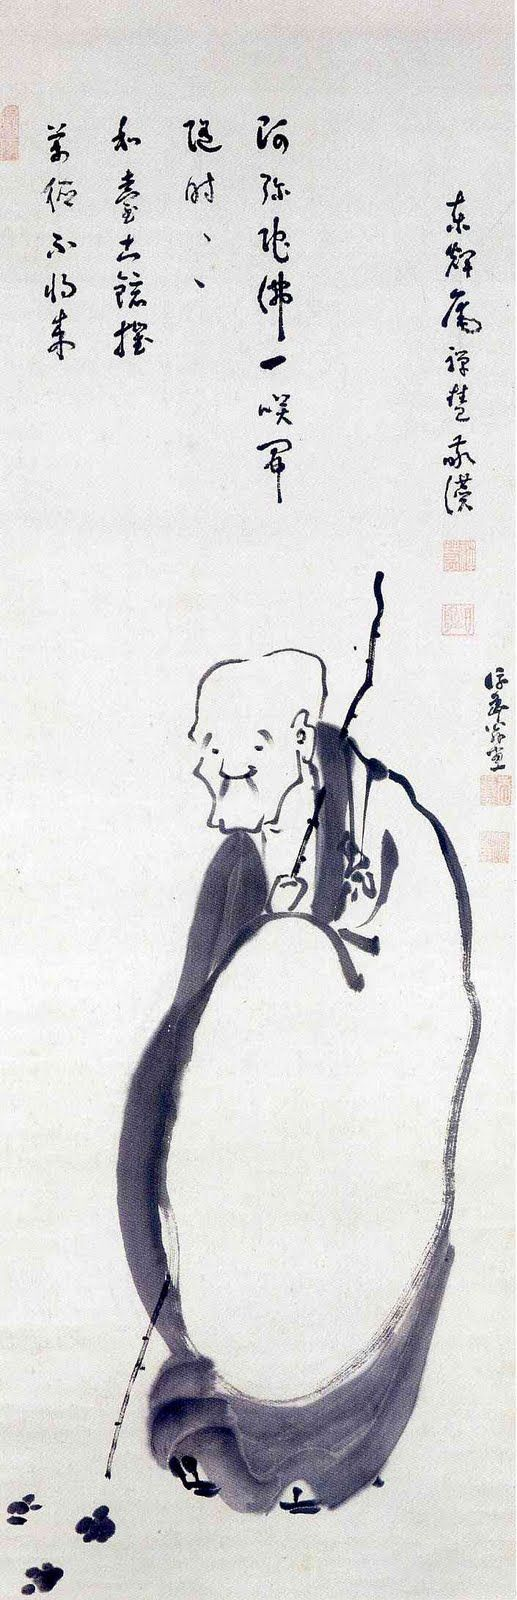 17th - 20th century, Japan, Ink